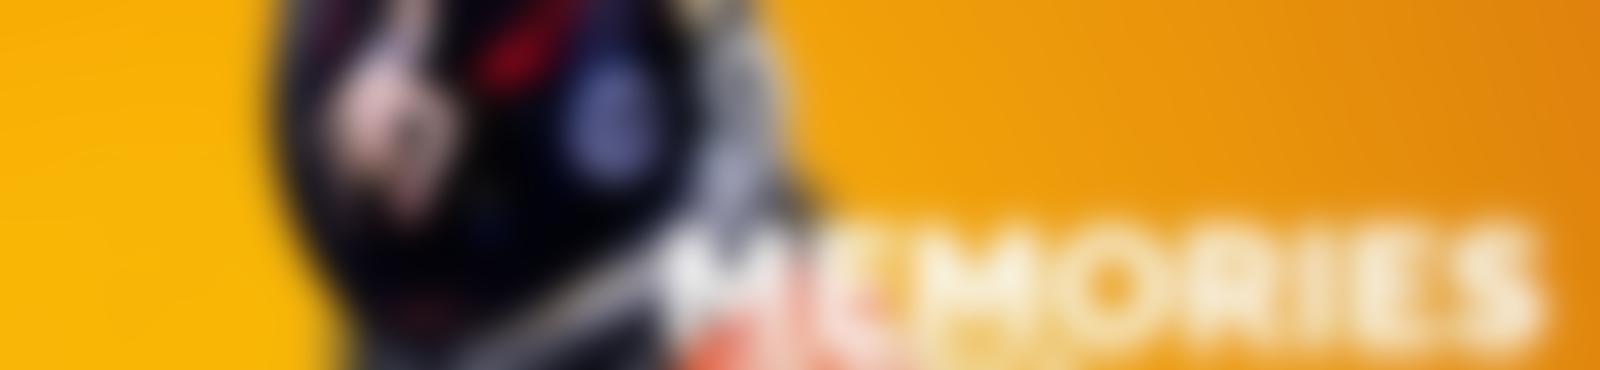 Blurred d5332c55 bf90 4f42 9a5c 0e0ef747cc06